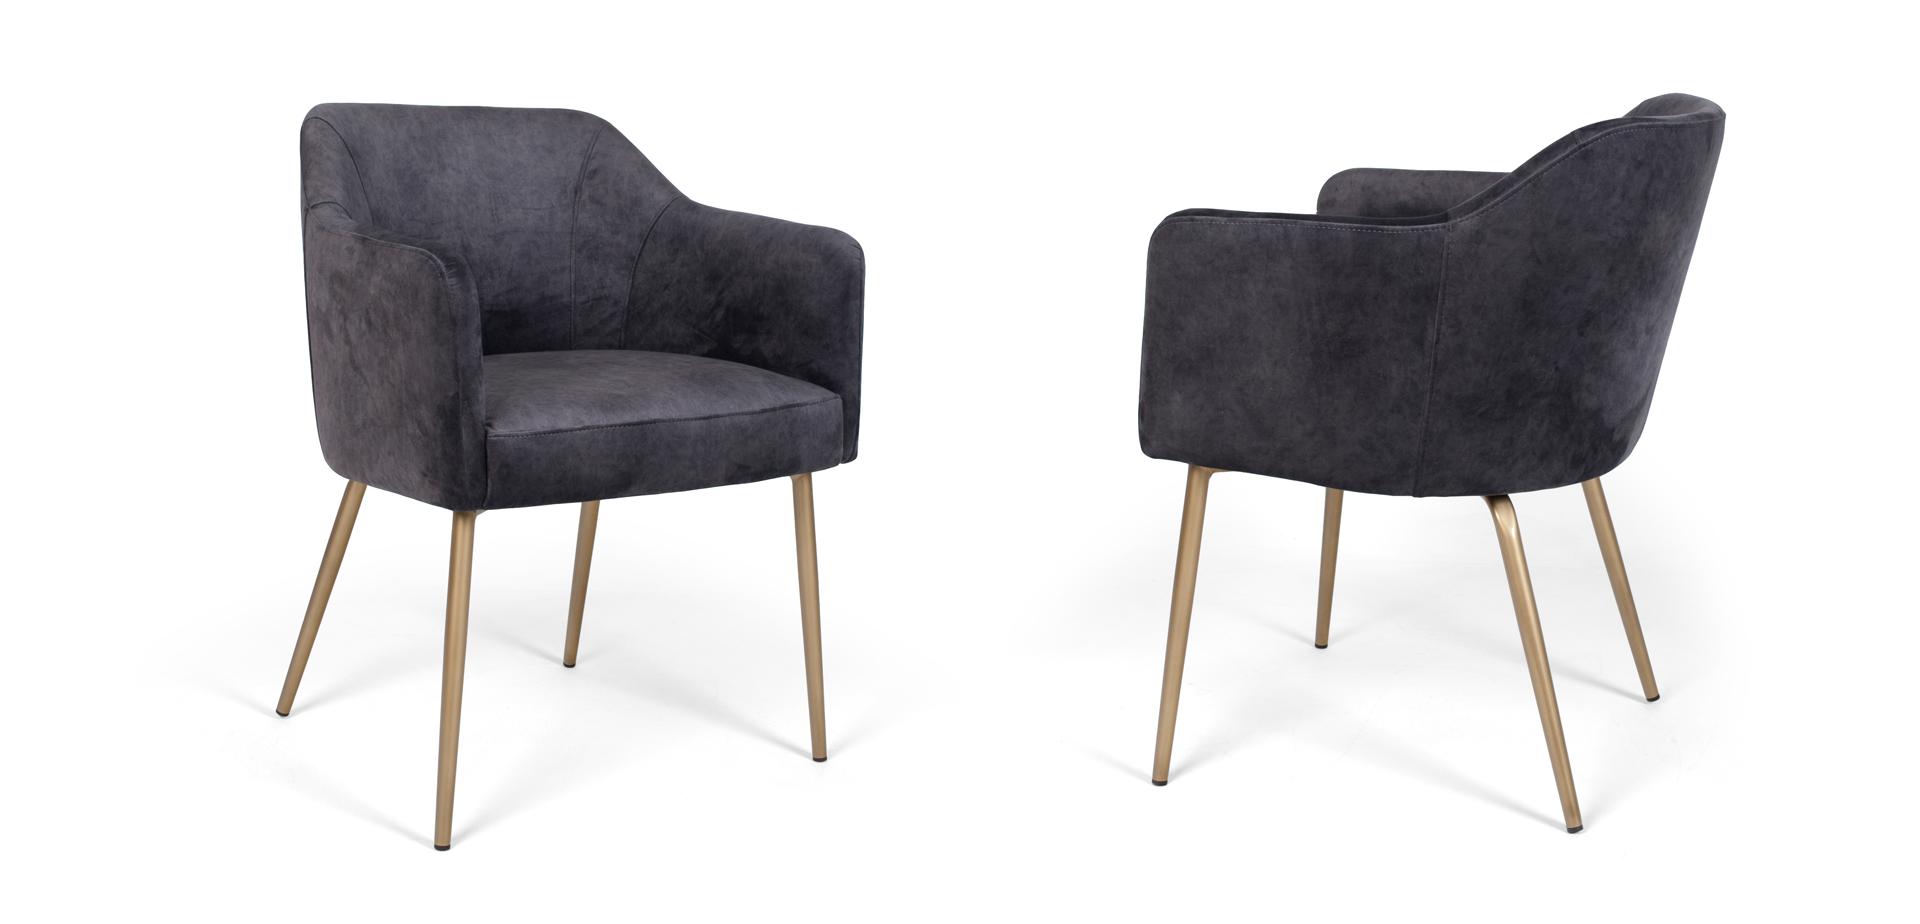 sofia-scaun-12.jpg